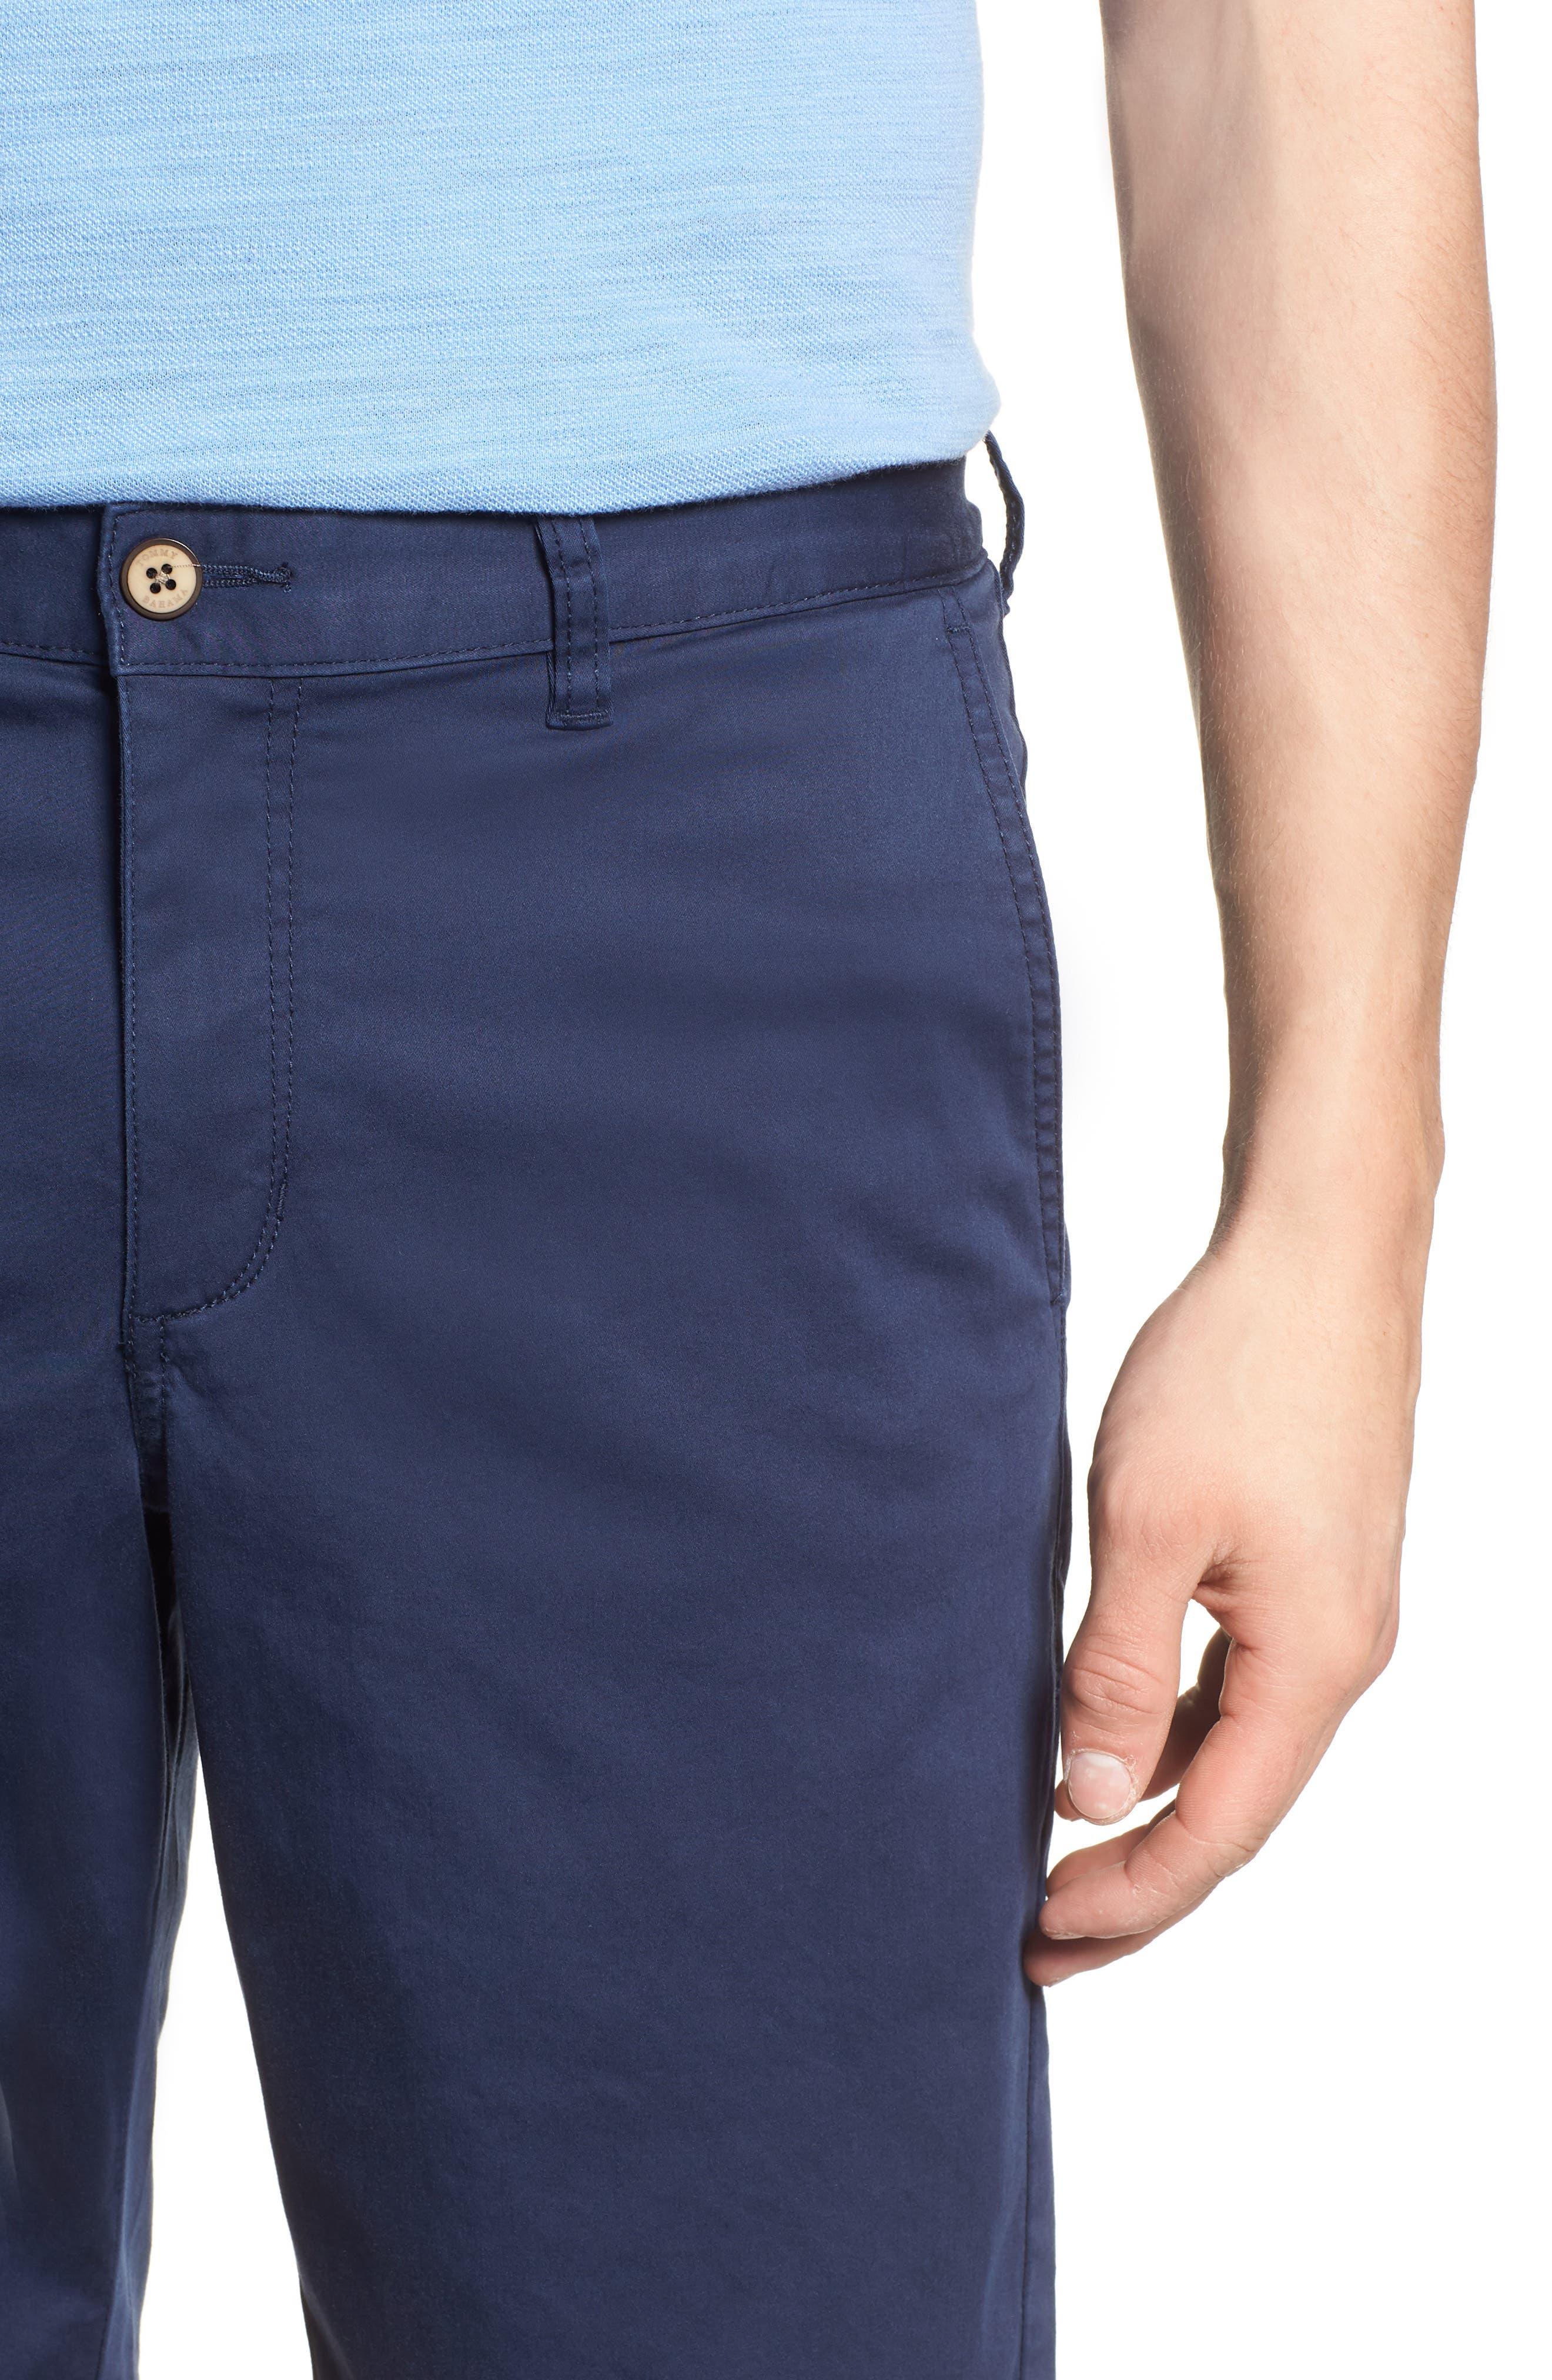 Boracay Chino Shorts,                             Alternate thumbnail 31, color,